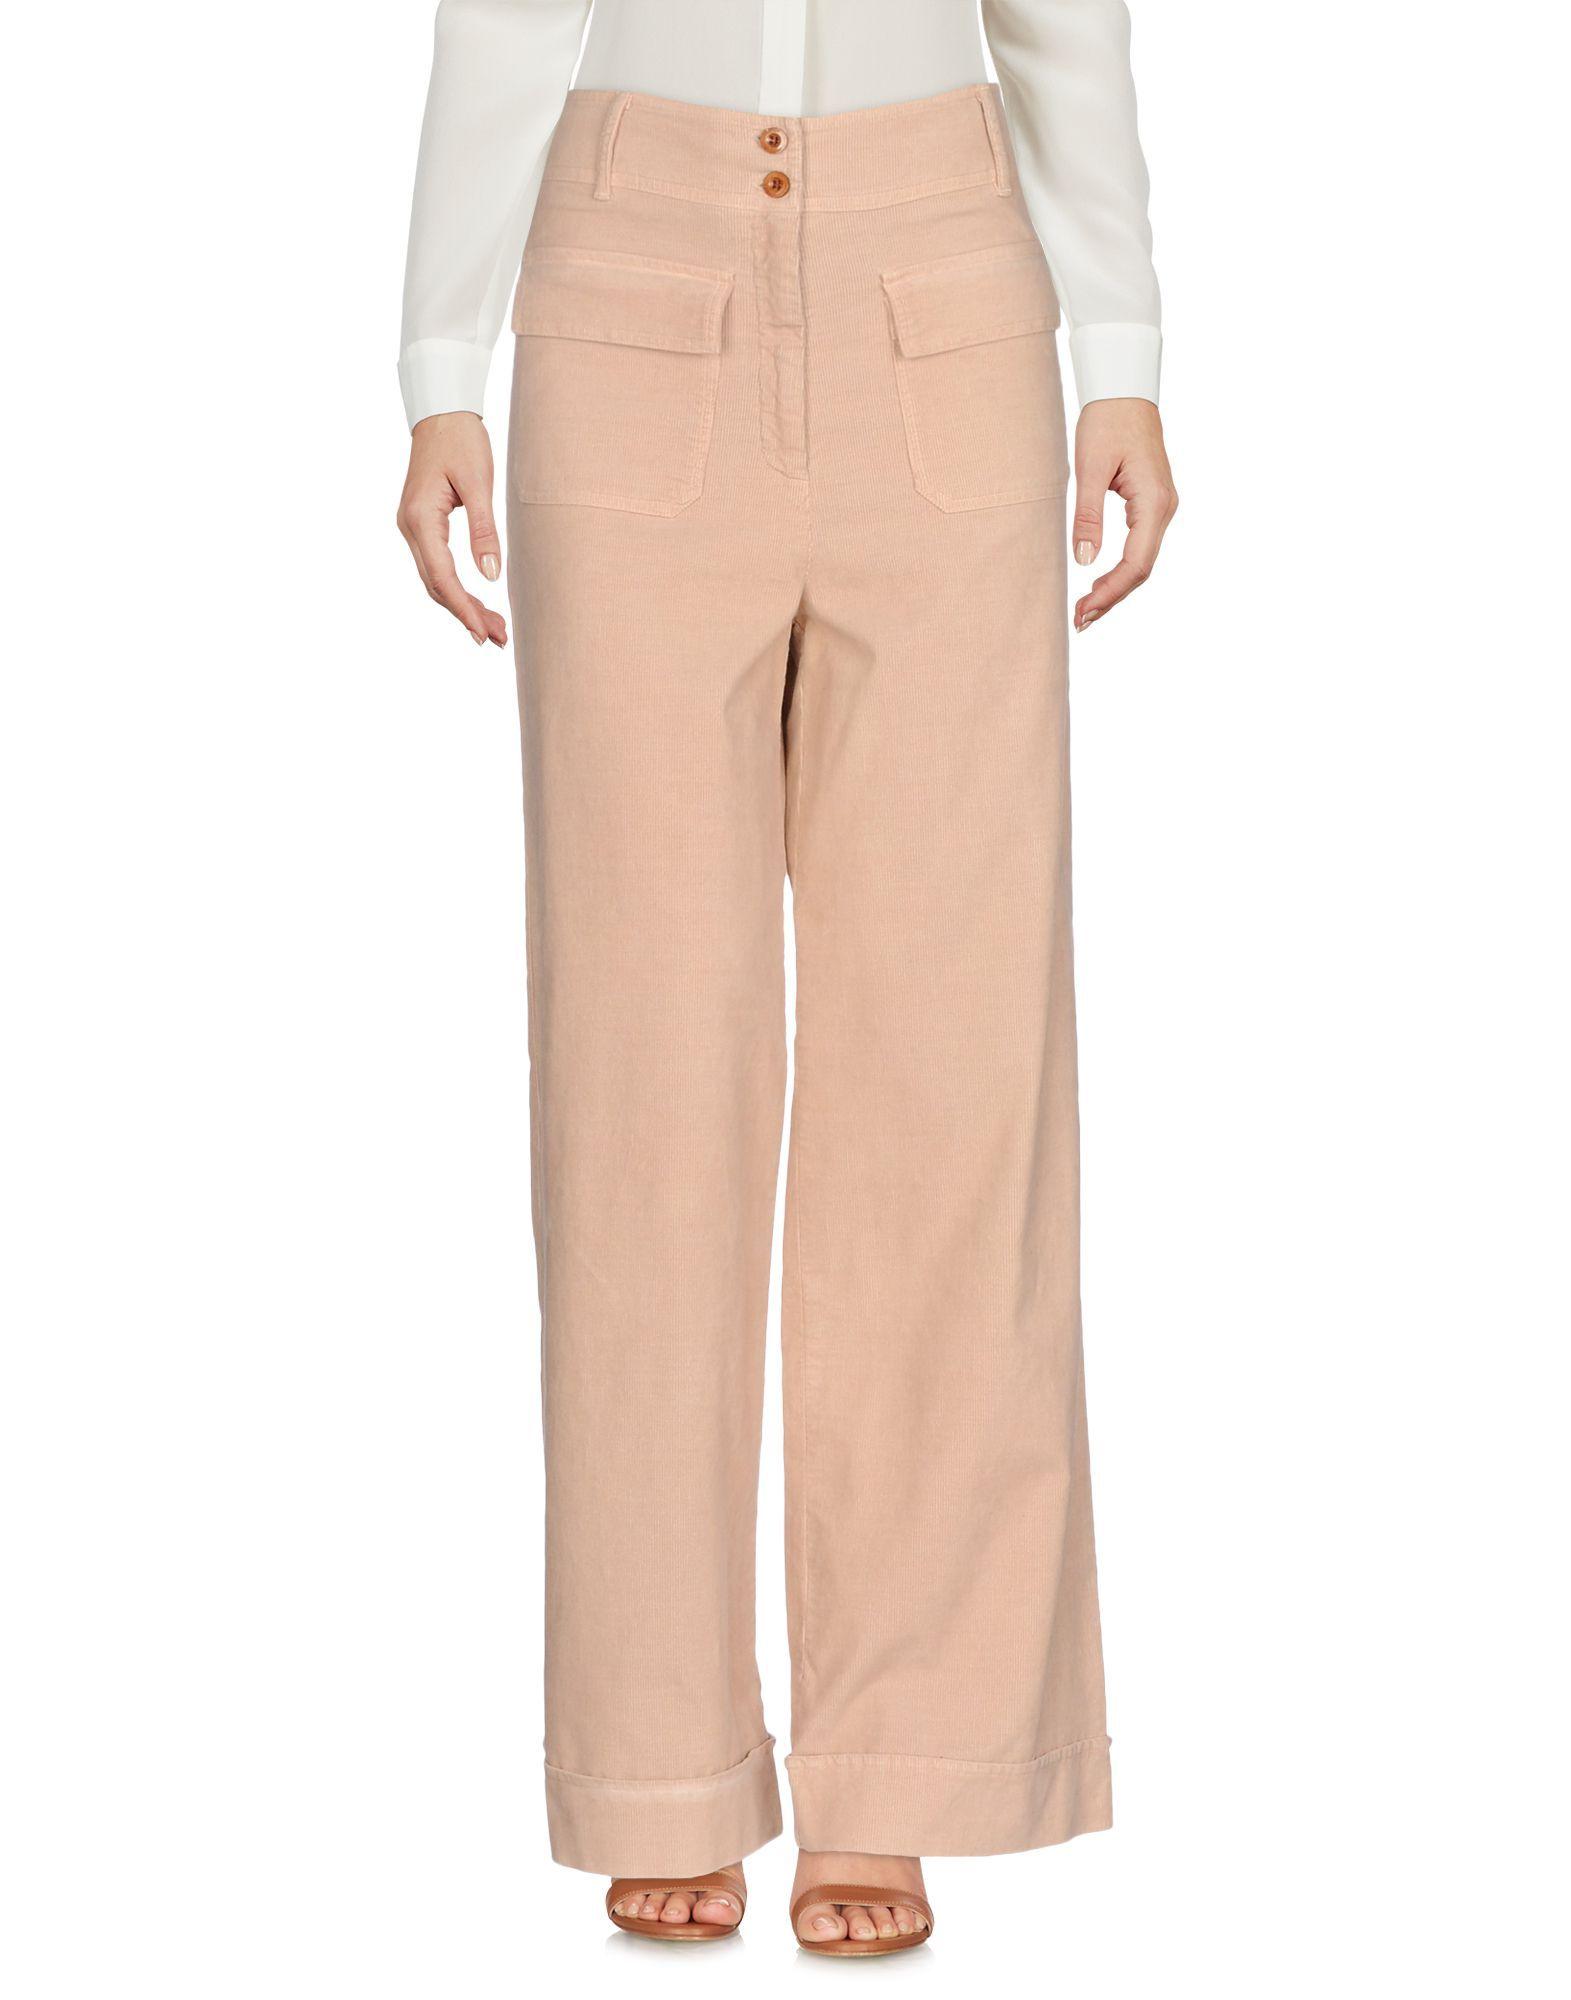 Sessun Sand Cotton Wide Leg Trousers